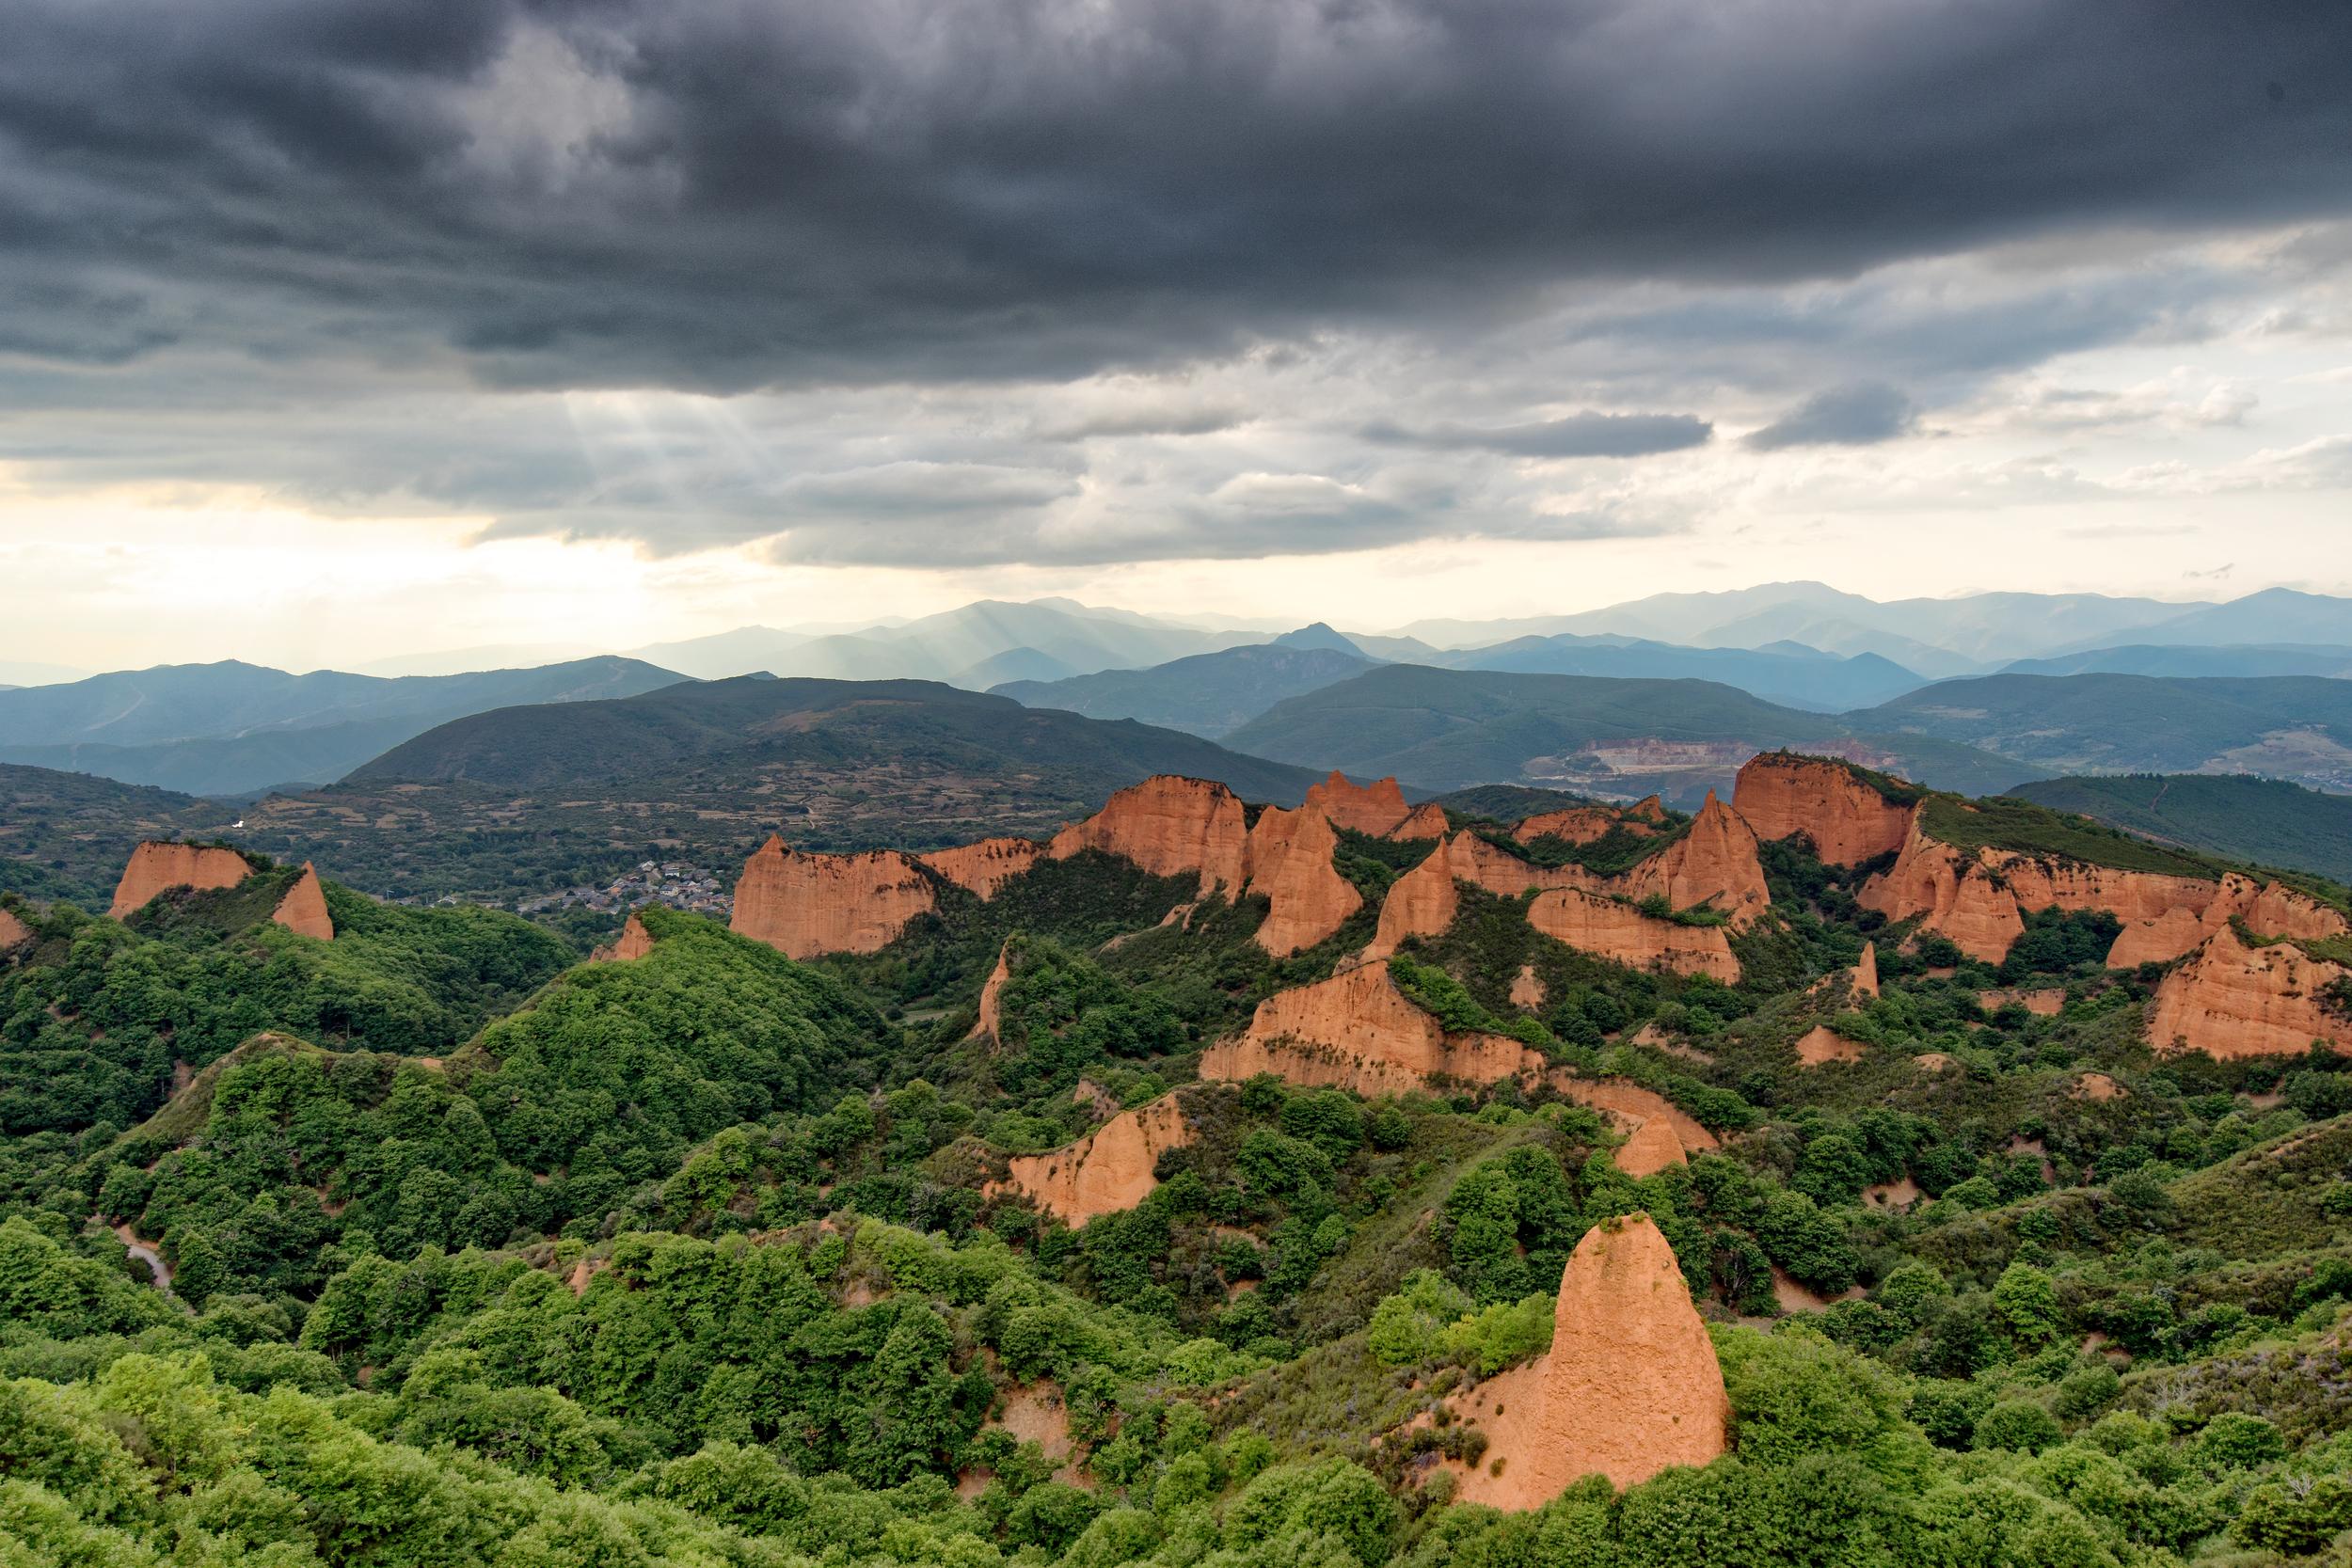 Viewpoint of Las Médulas from Mirador de Orellán | Photo Credit: Benoît Lefèvre -  Vino2Travel